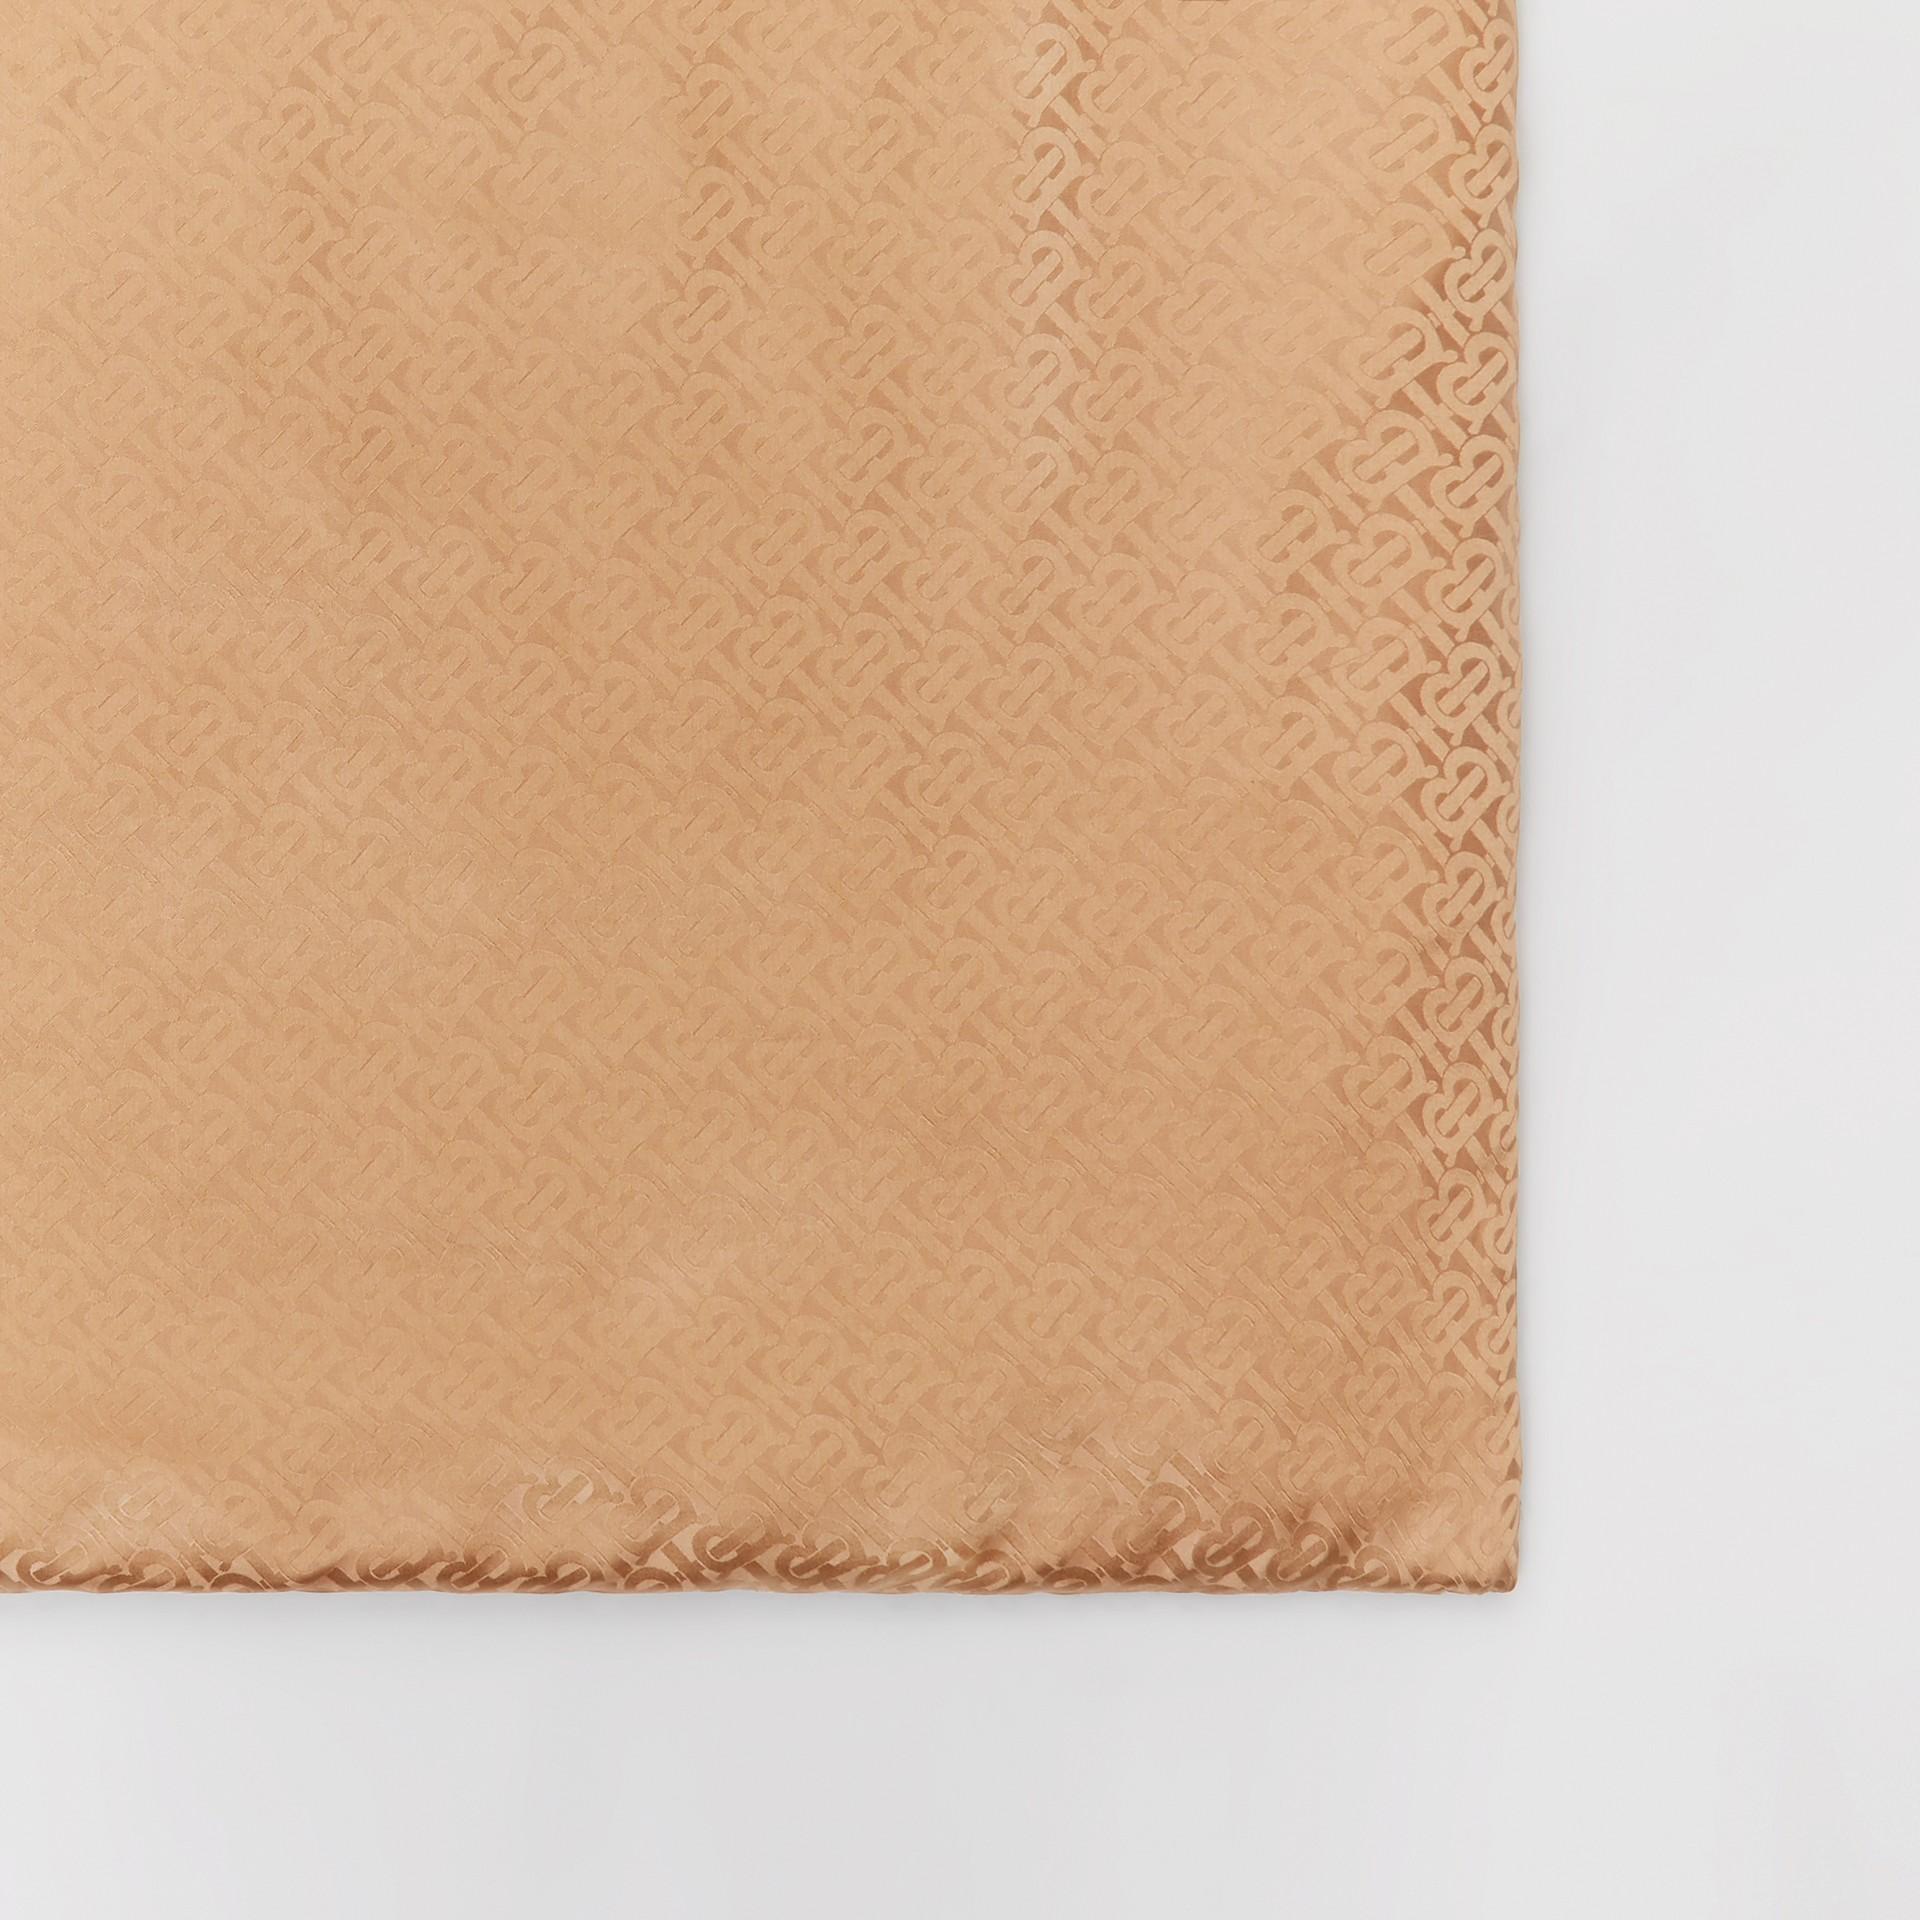 Unicorn Print Monogram Silk Satin Jacquard Throw in Camel | Burberry Canada - gallery image 3